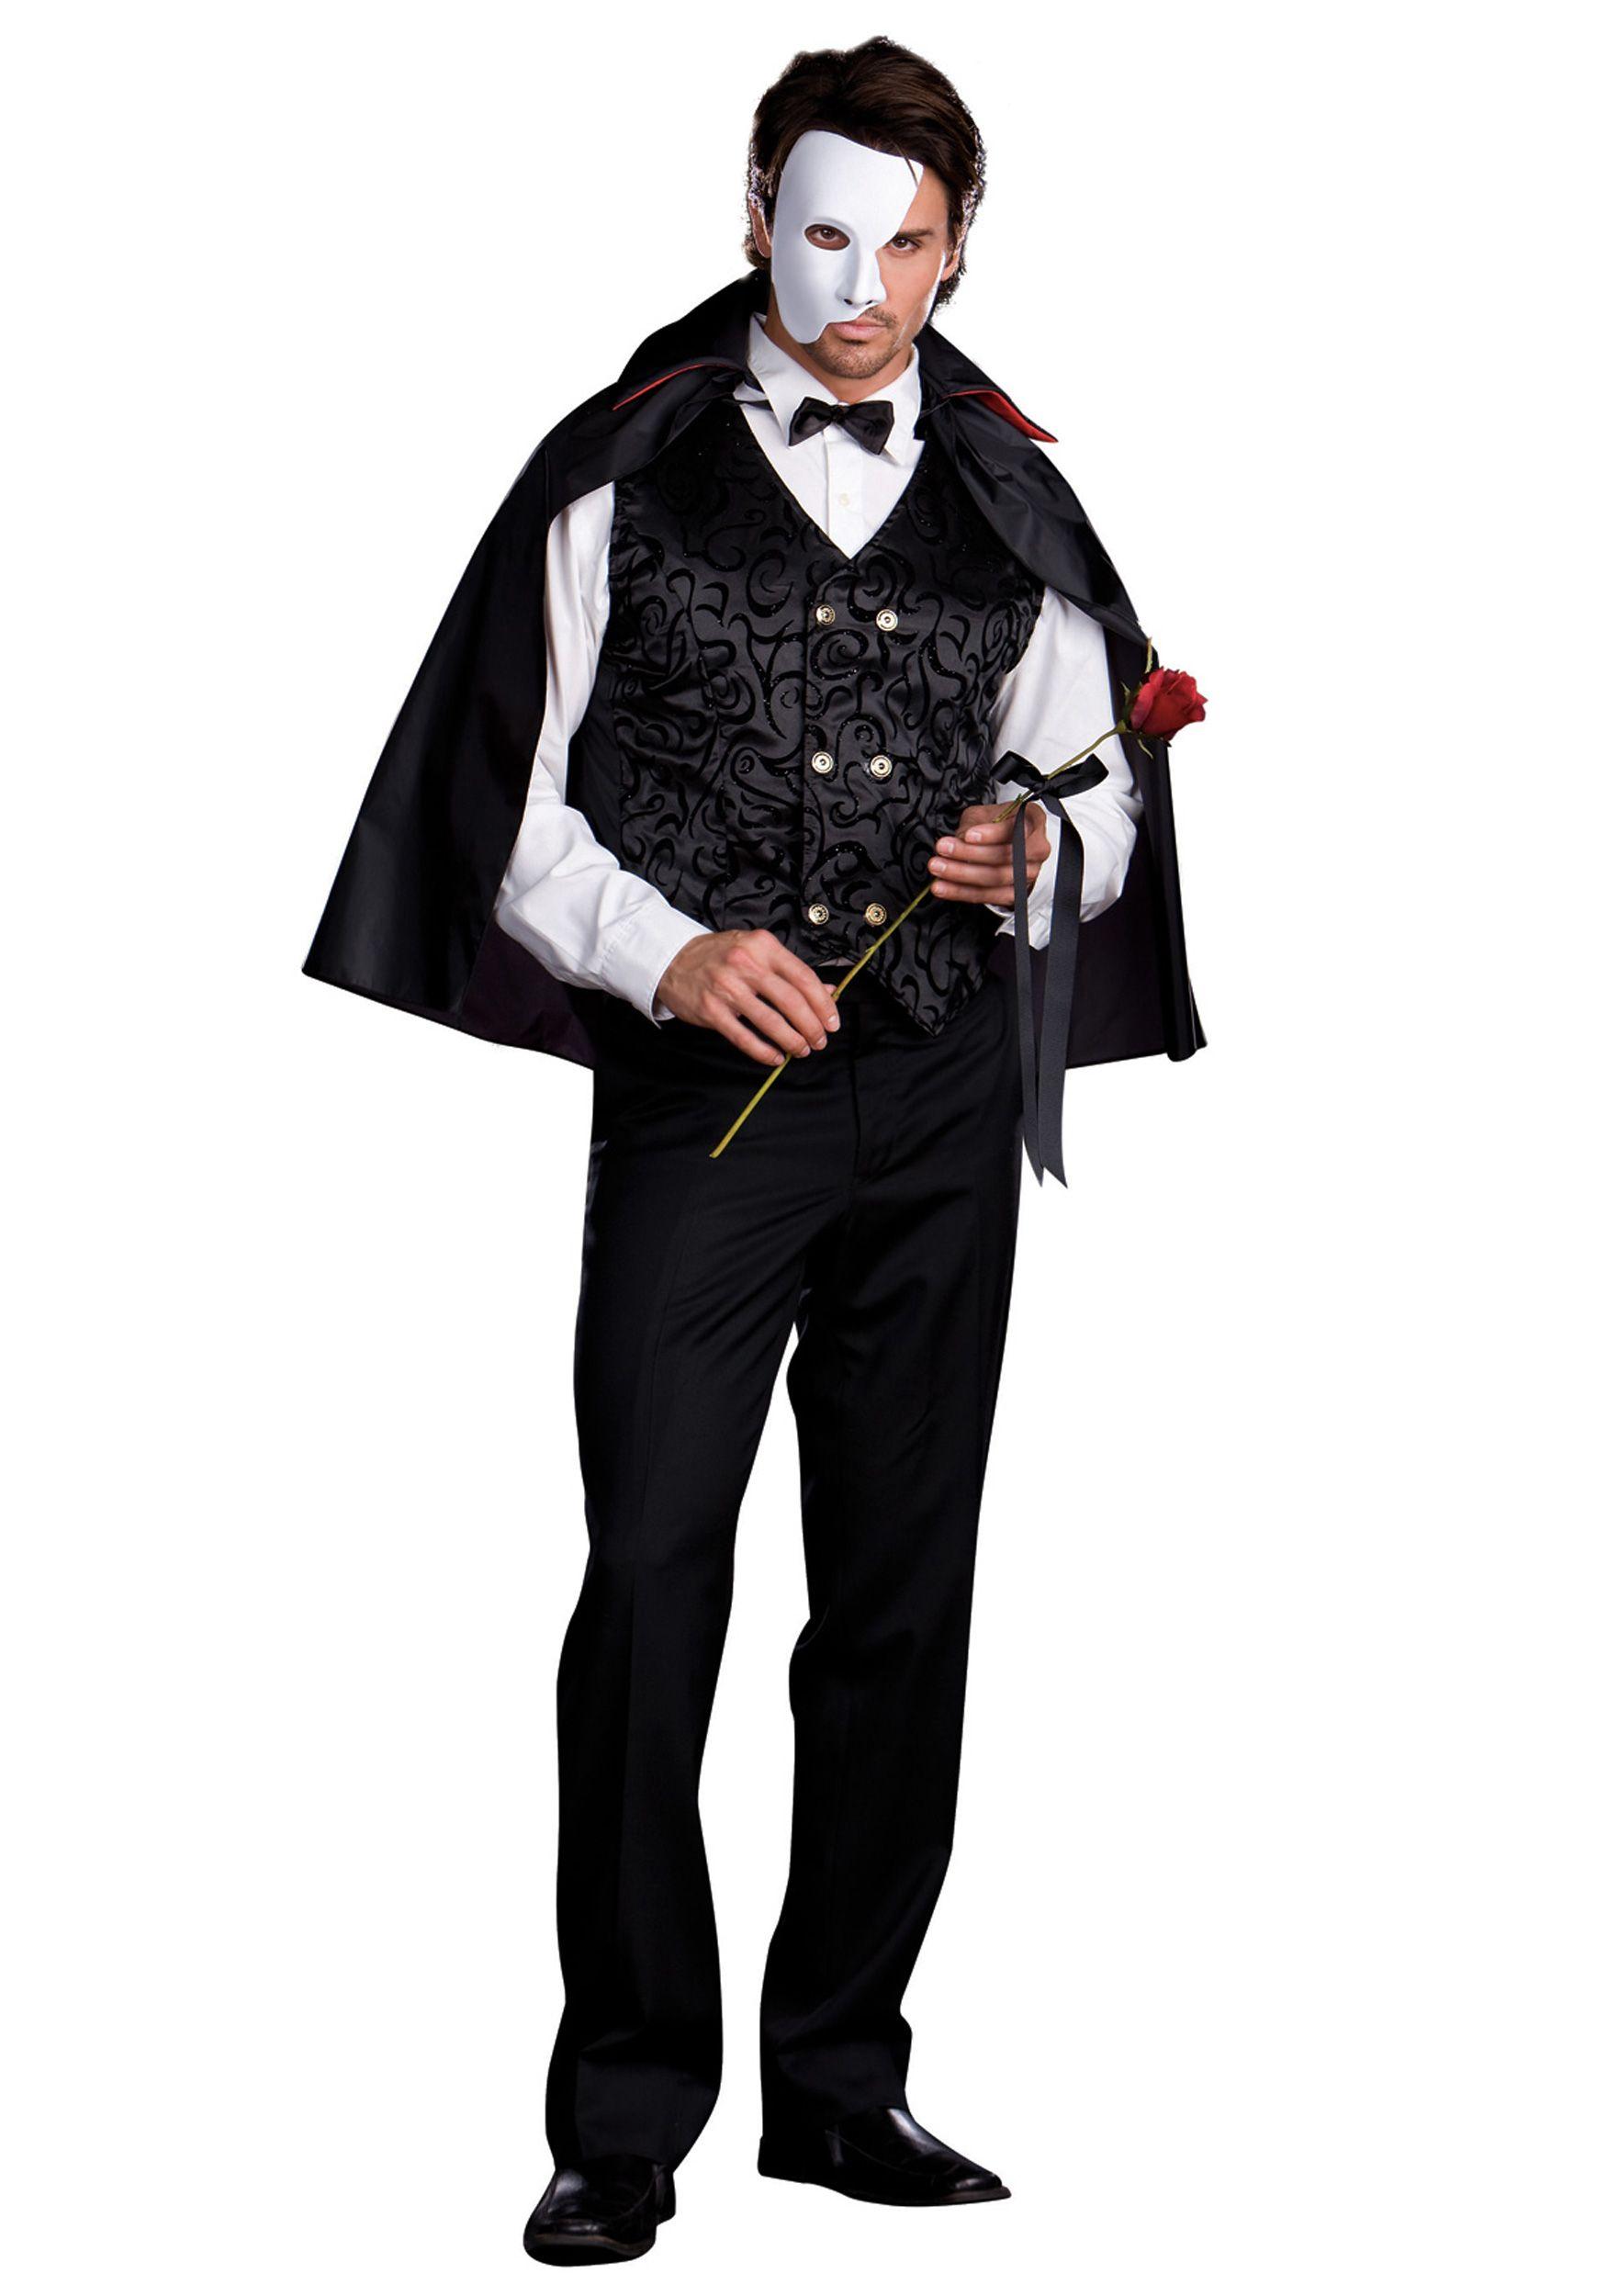 image detail for adult phantom gentleman costume masquerade costumes for men halloween - Masquerade Costumes Halloween